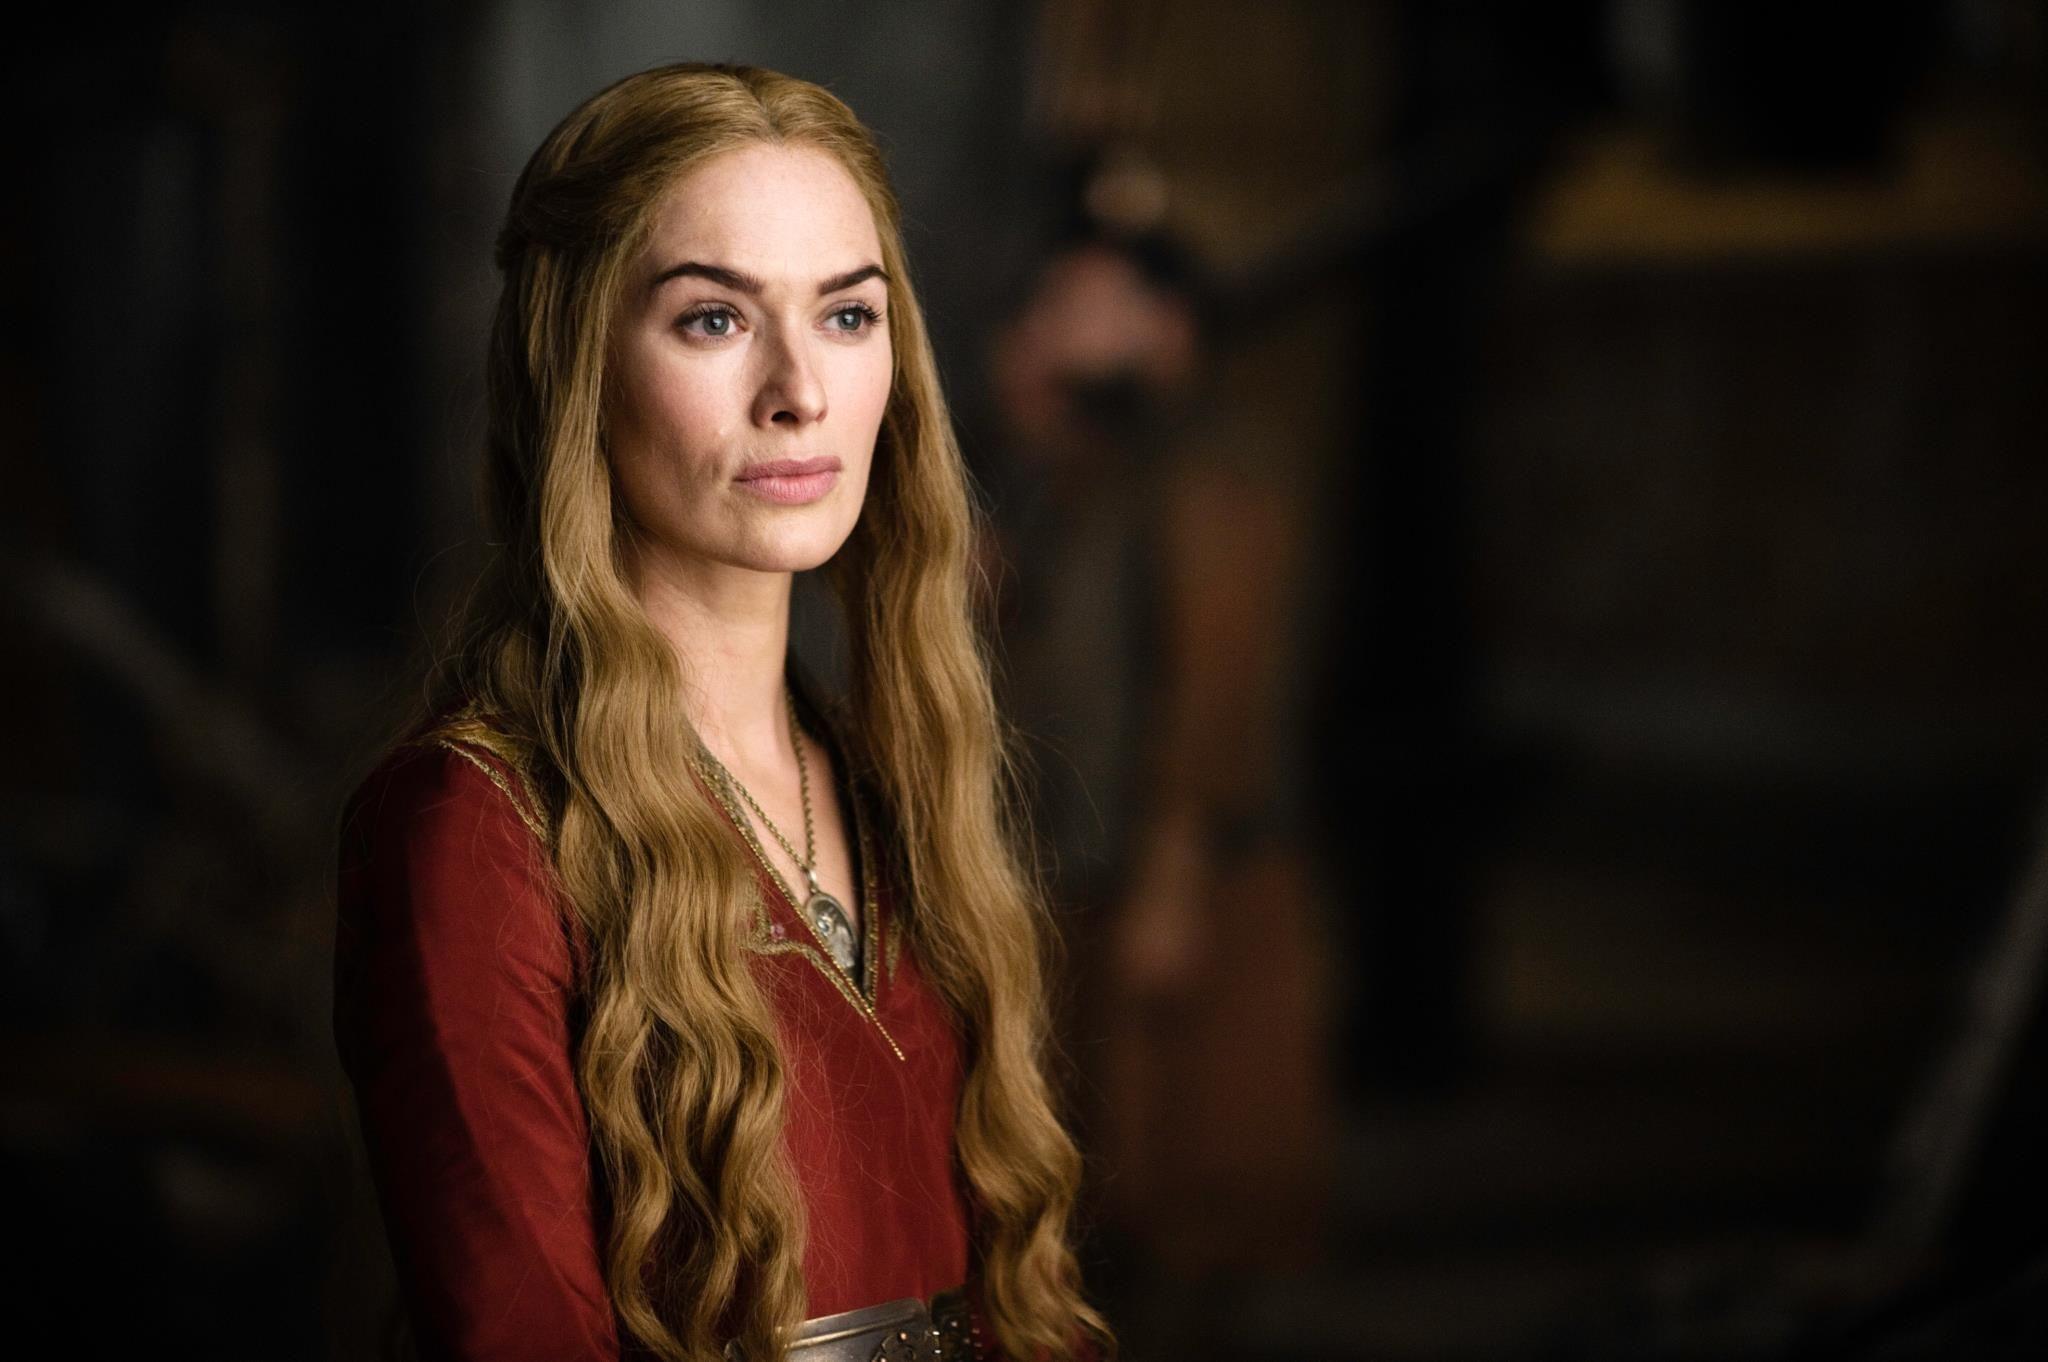 Game of Thrones - Season 2 Episode 1 Still